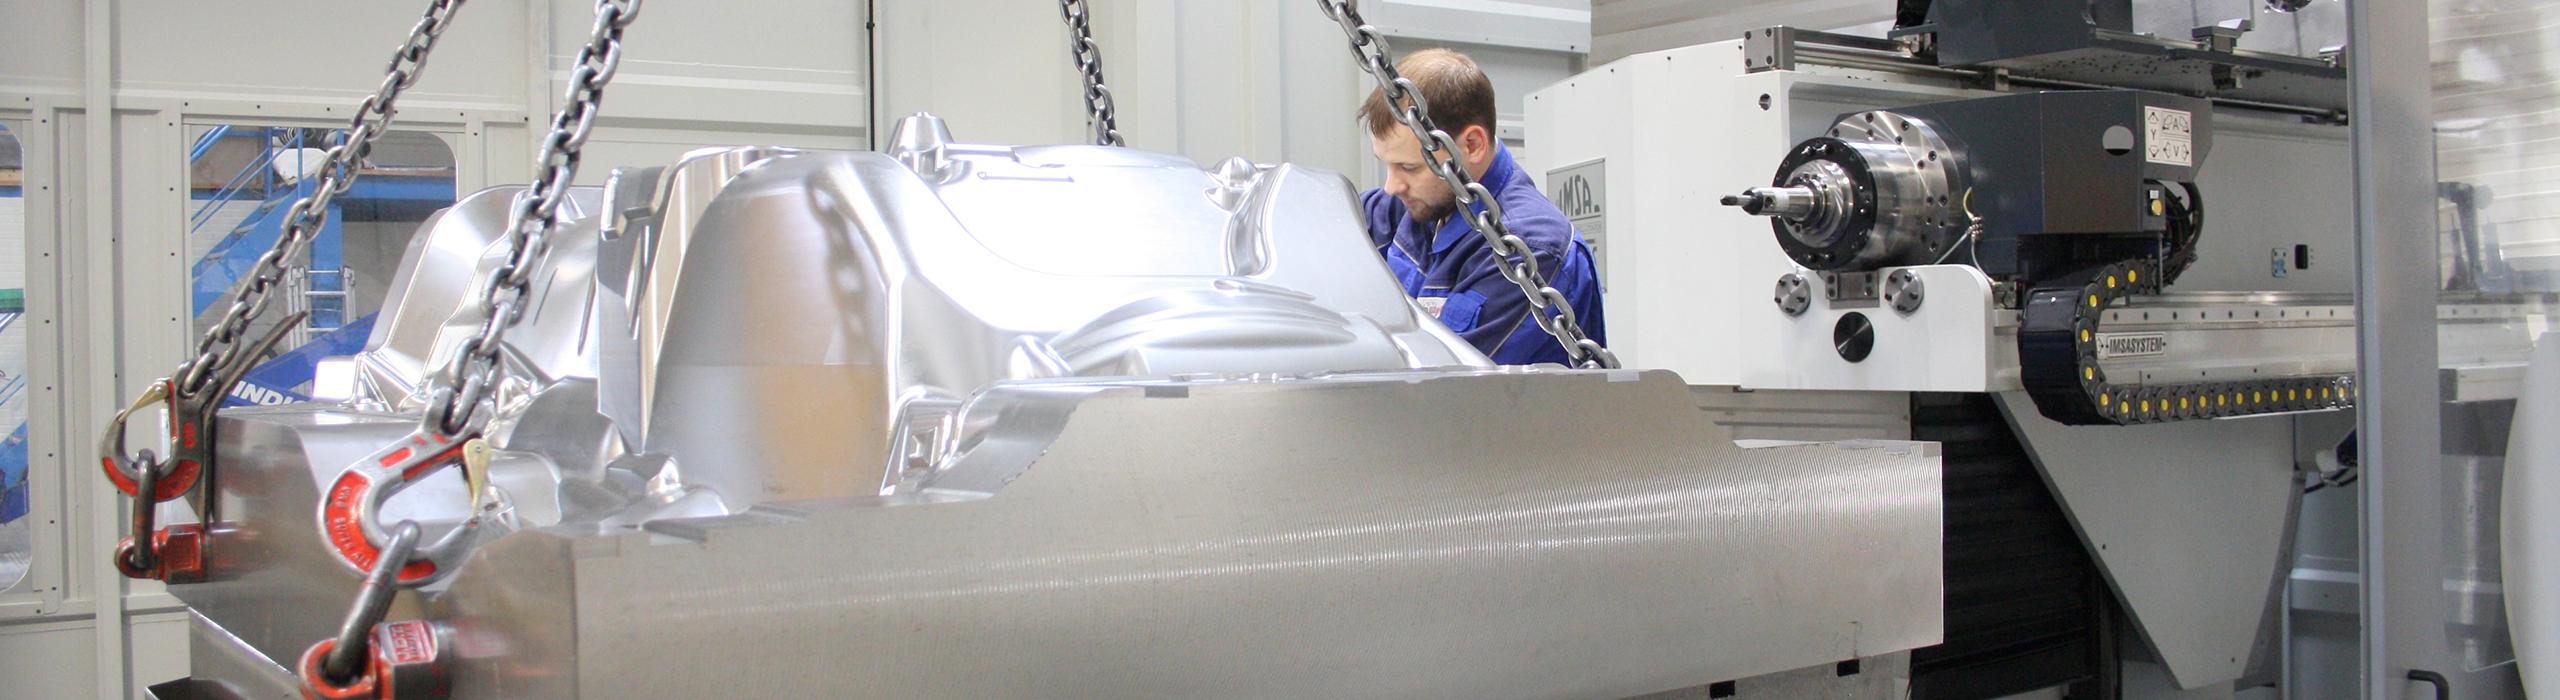 RSB-Stahl-tiefborhen-header2